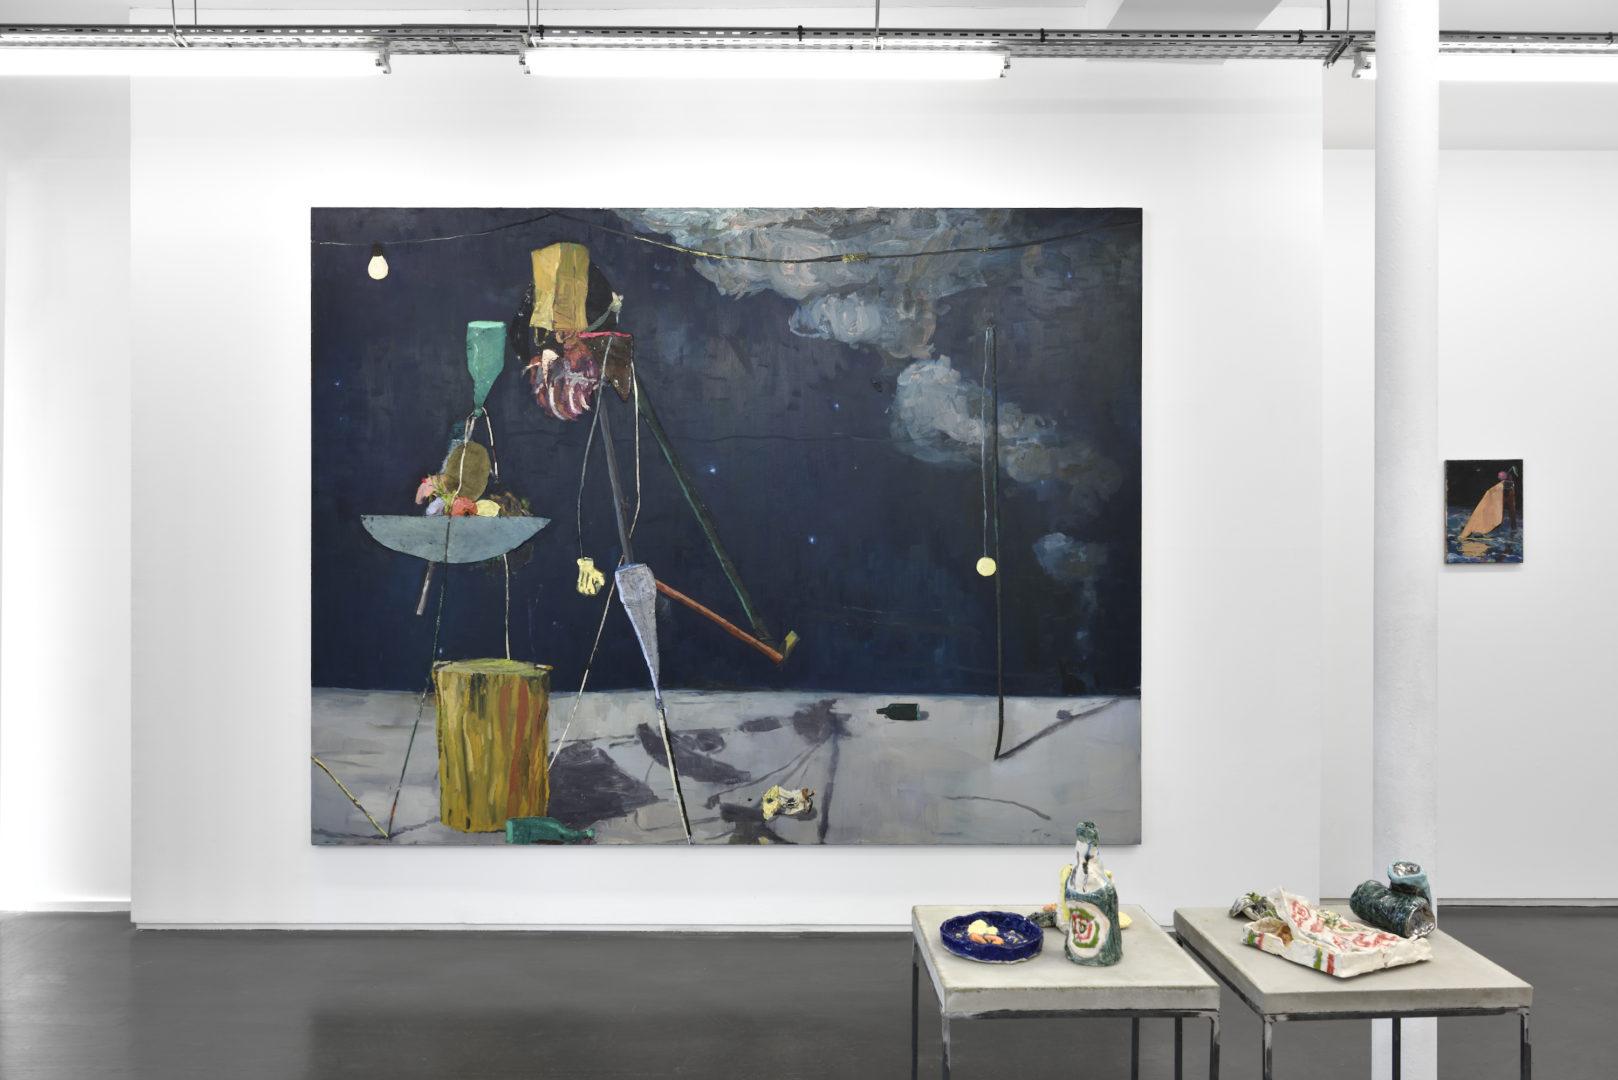 Vue de l'exposition J.W.D. - Galerie Maïa Muller, 2017 ©Rebecca Fanuele